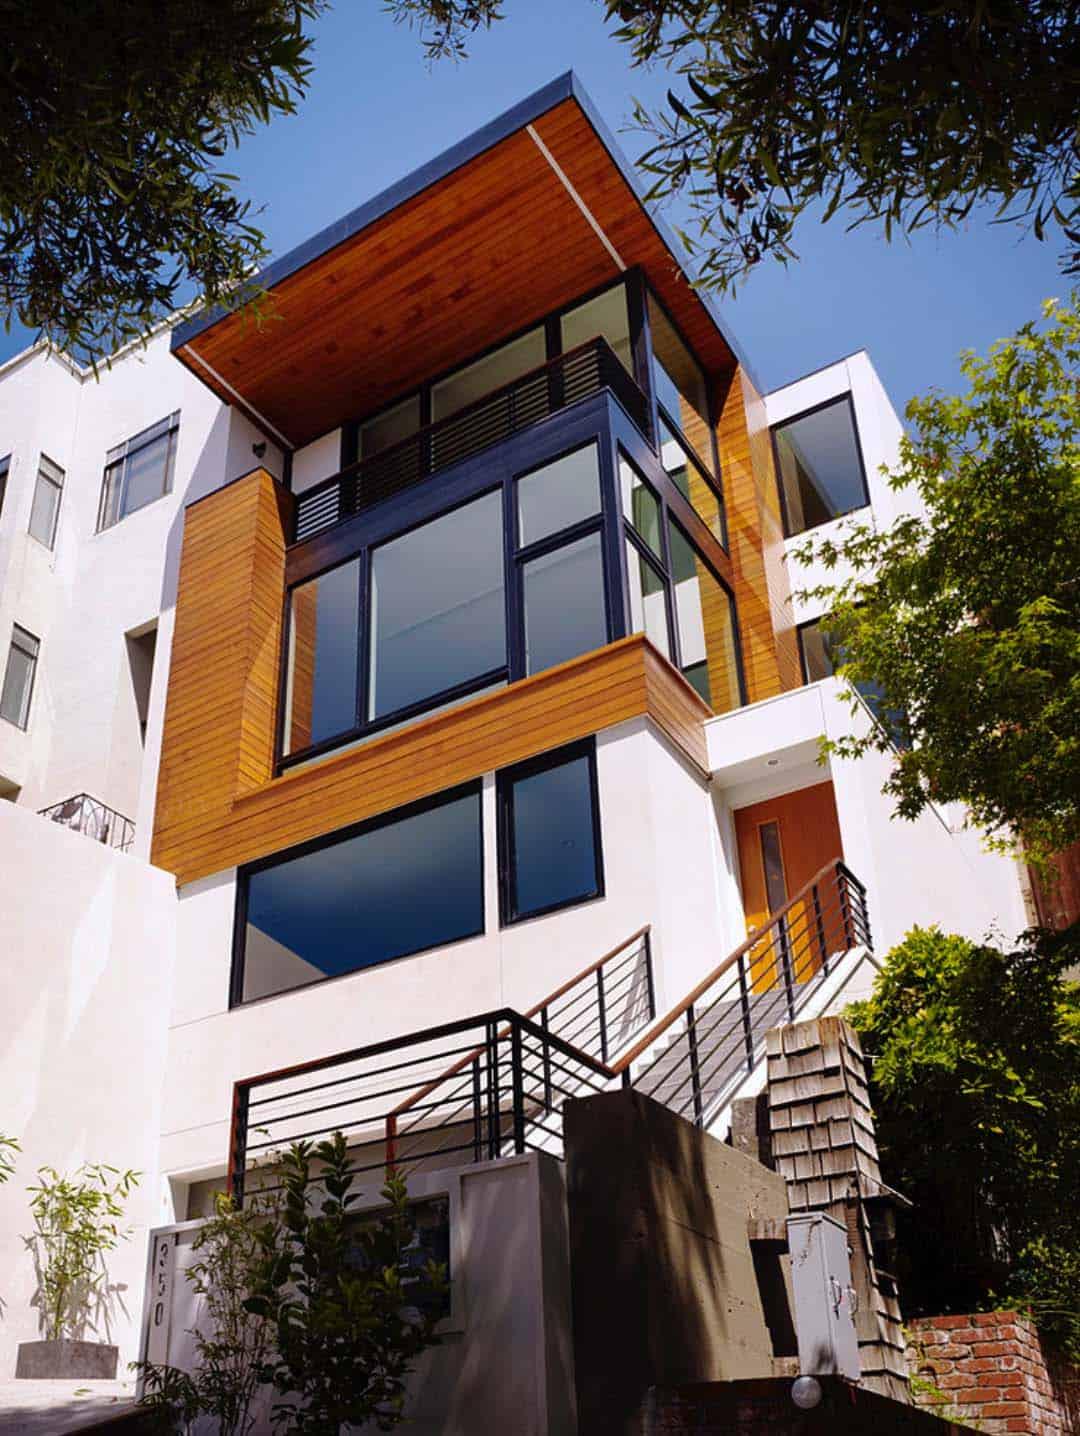 Architecture Modern Hillside Home-27-1 Kindesign